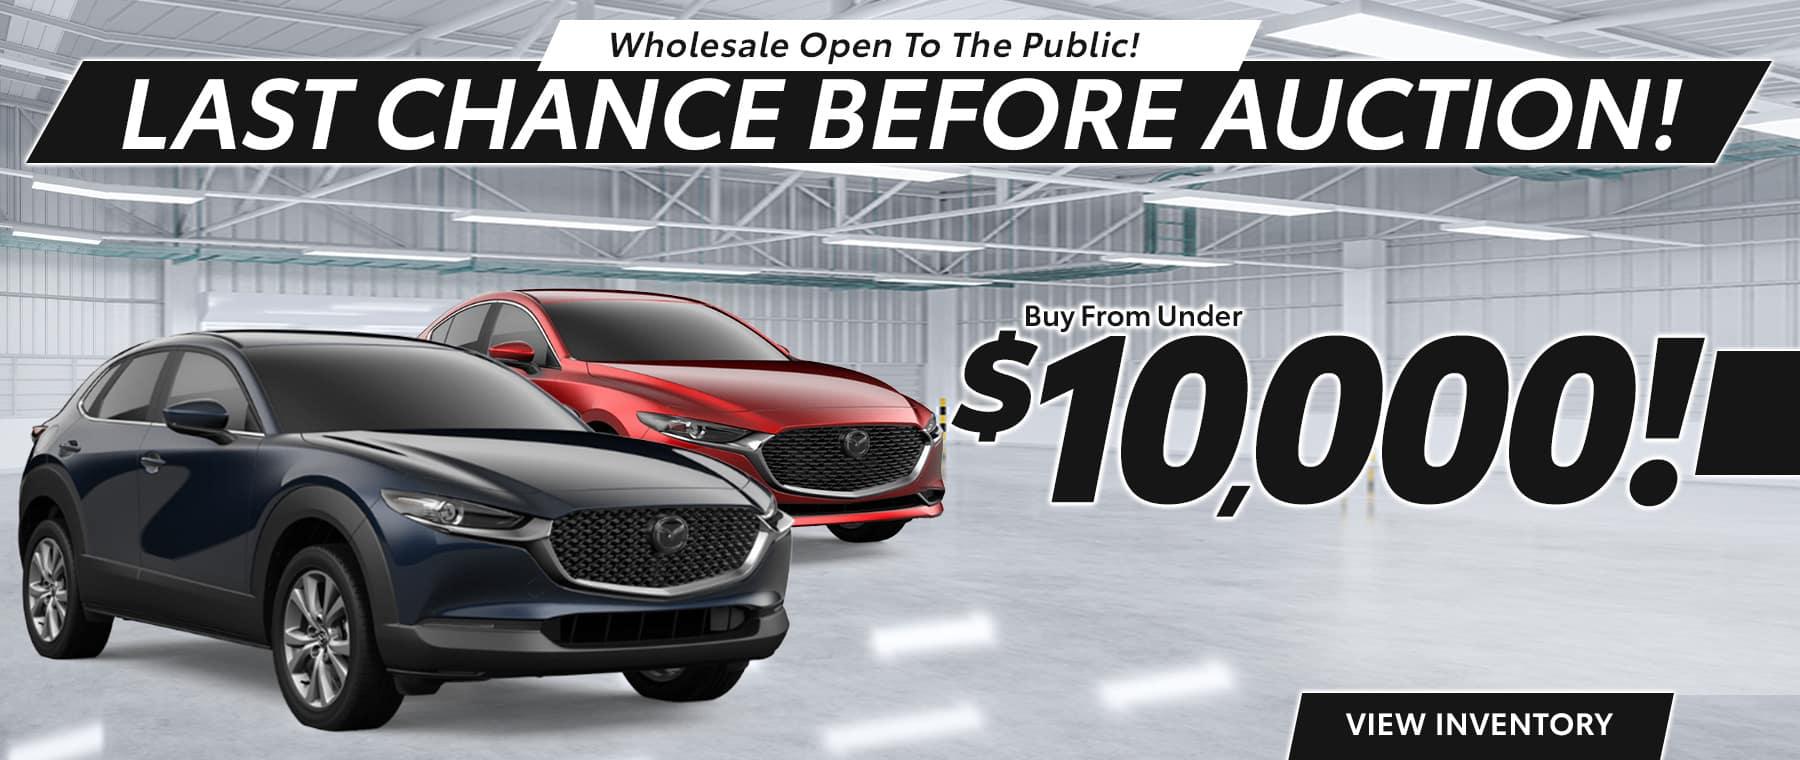 Wholesale Open to the Public!